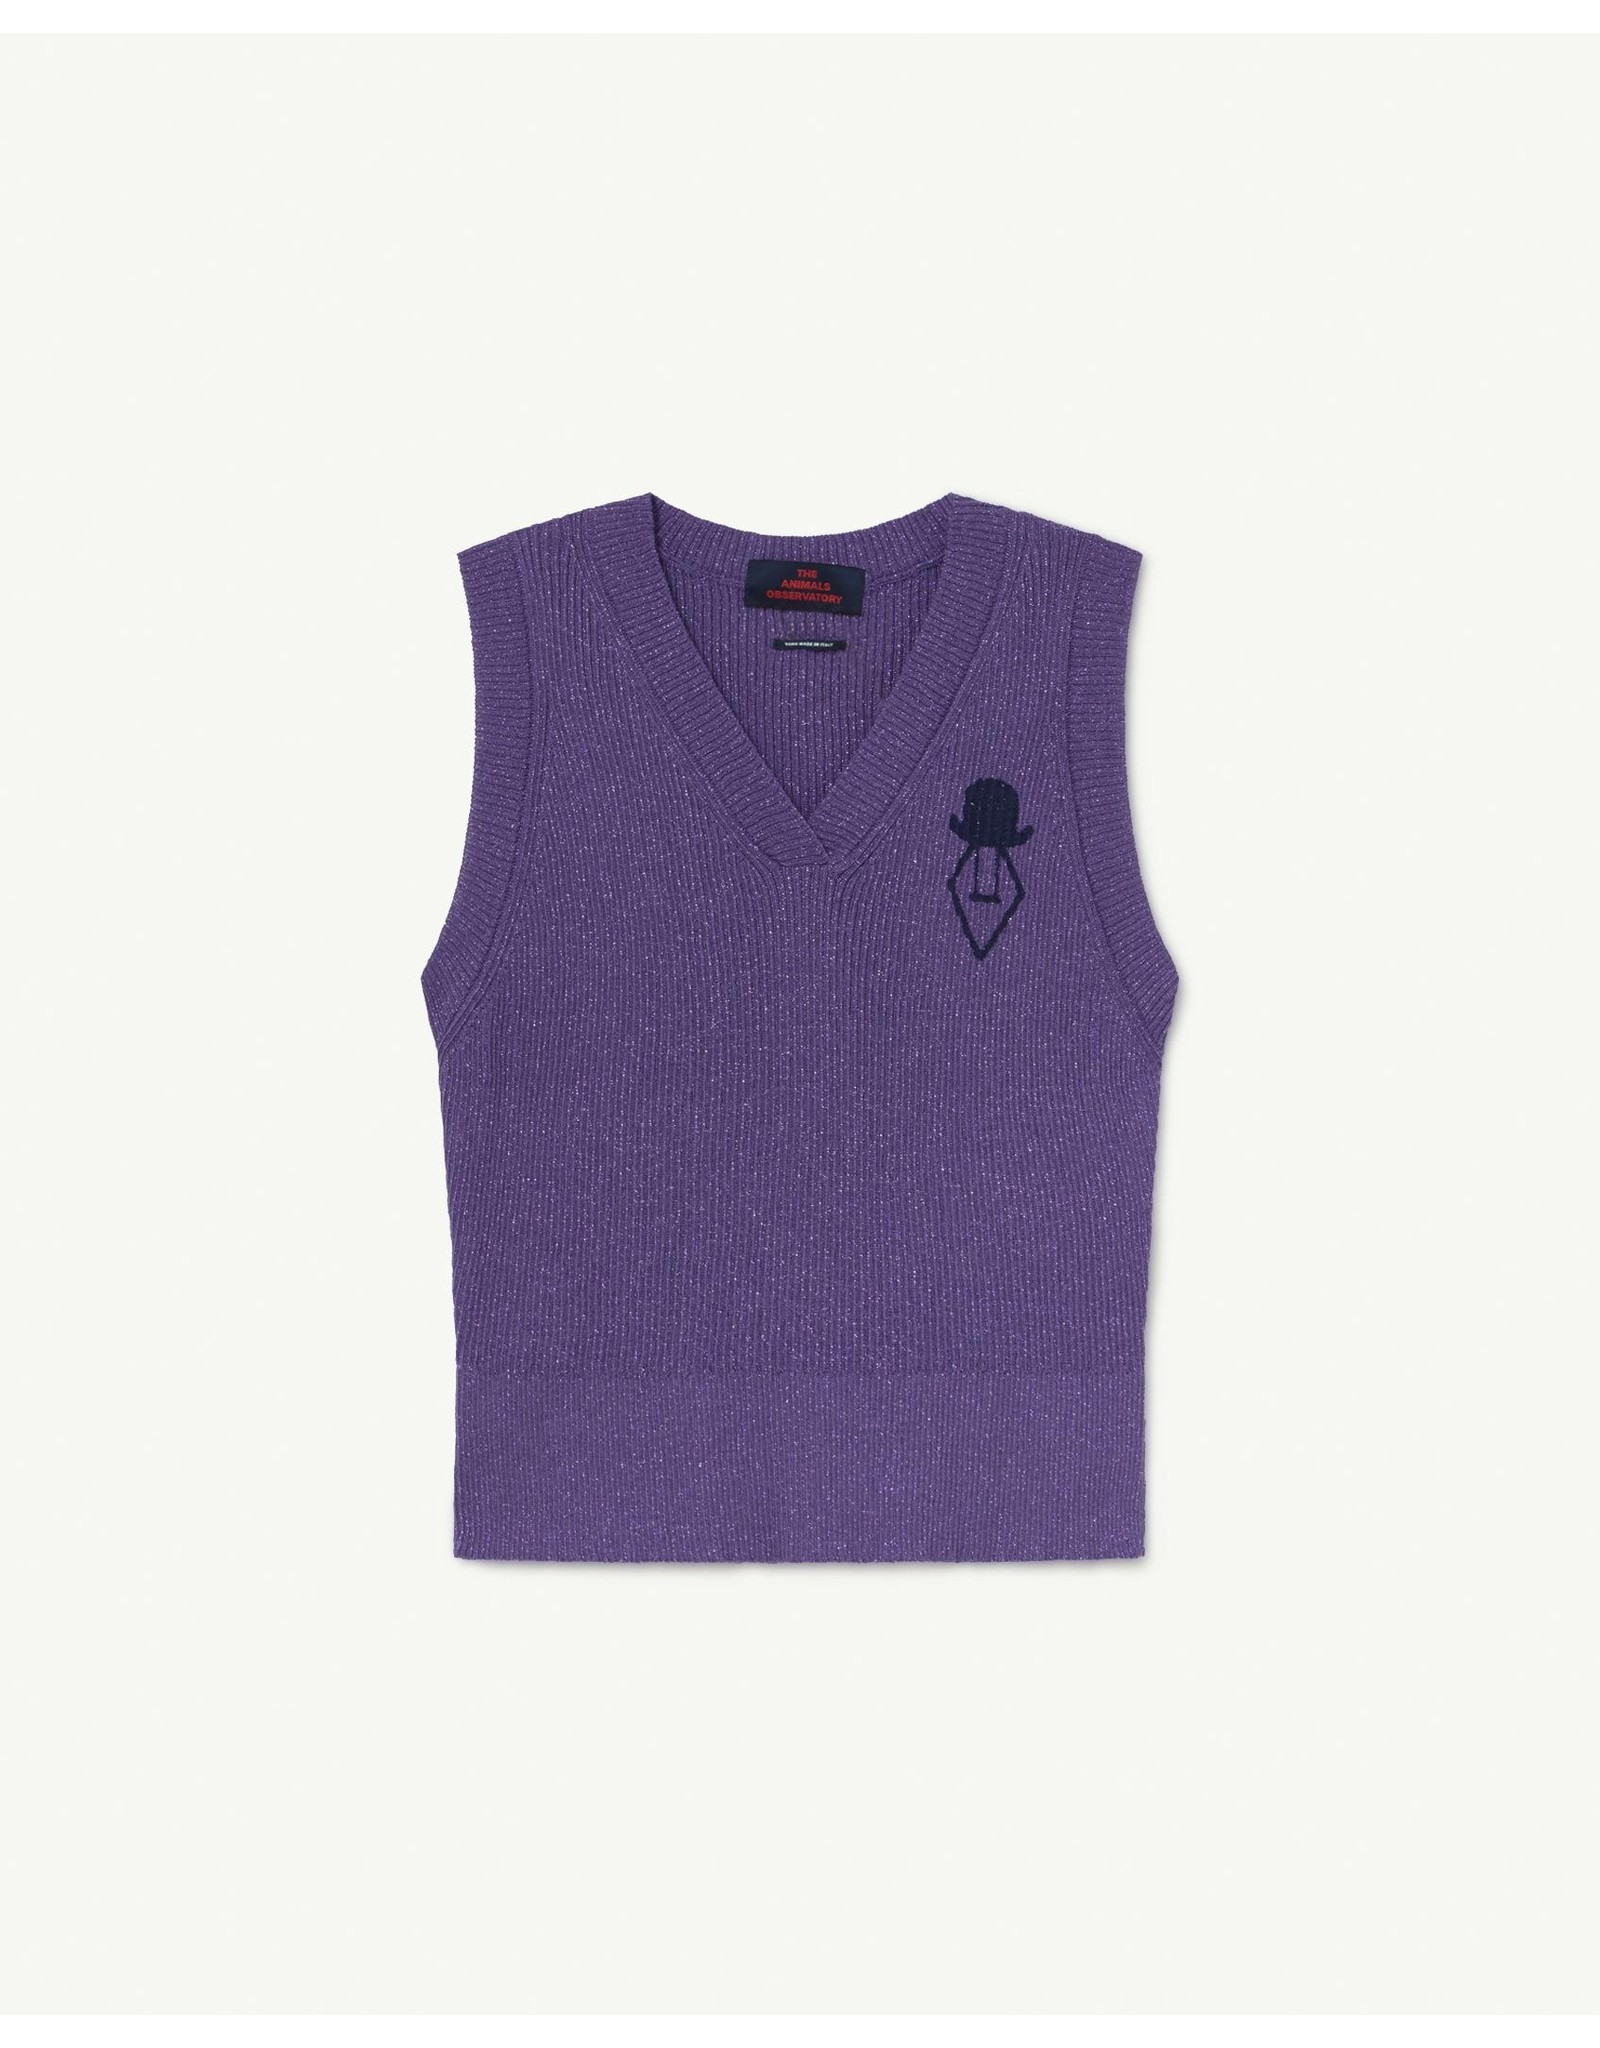 The Animal Observatory TAO SS21089 Bat vest purple logo